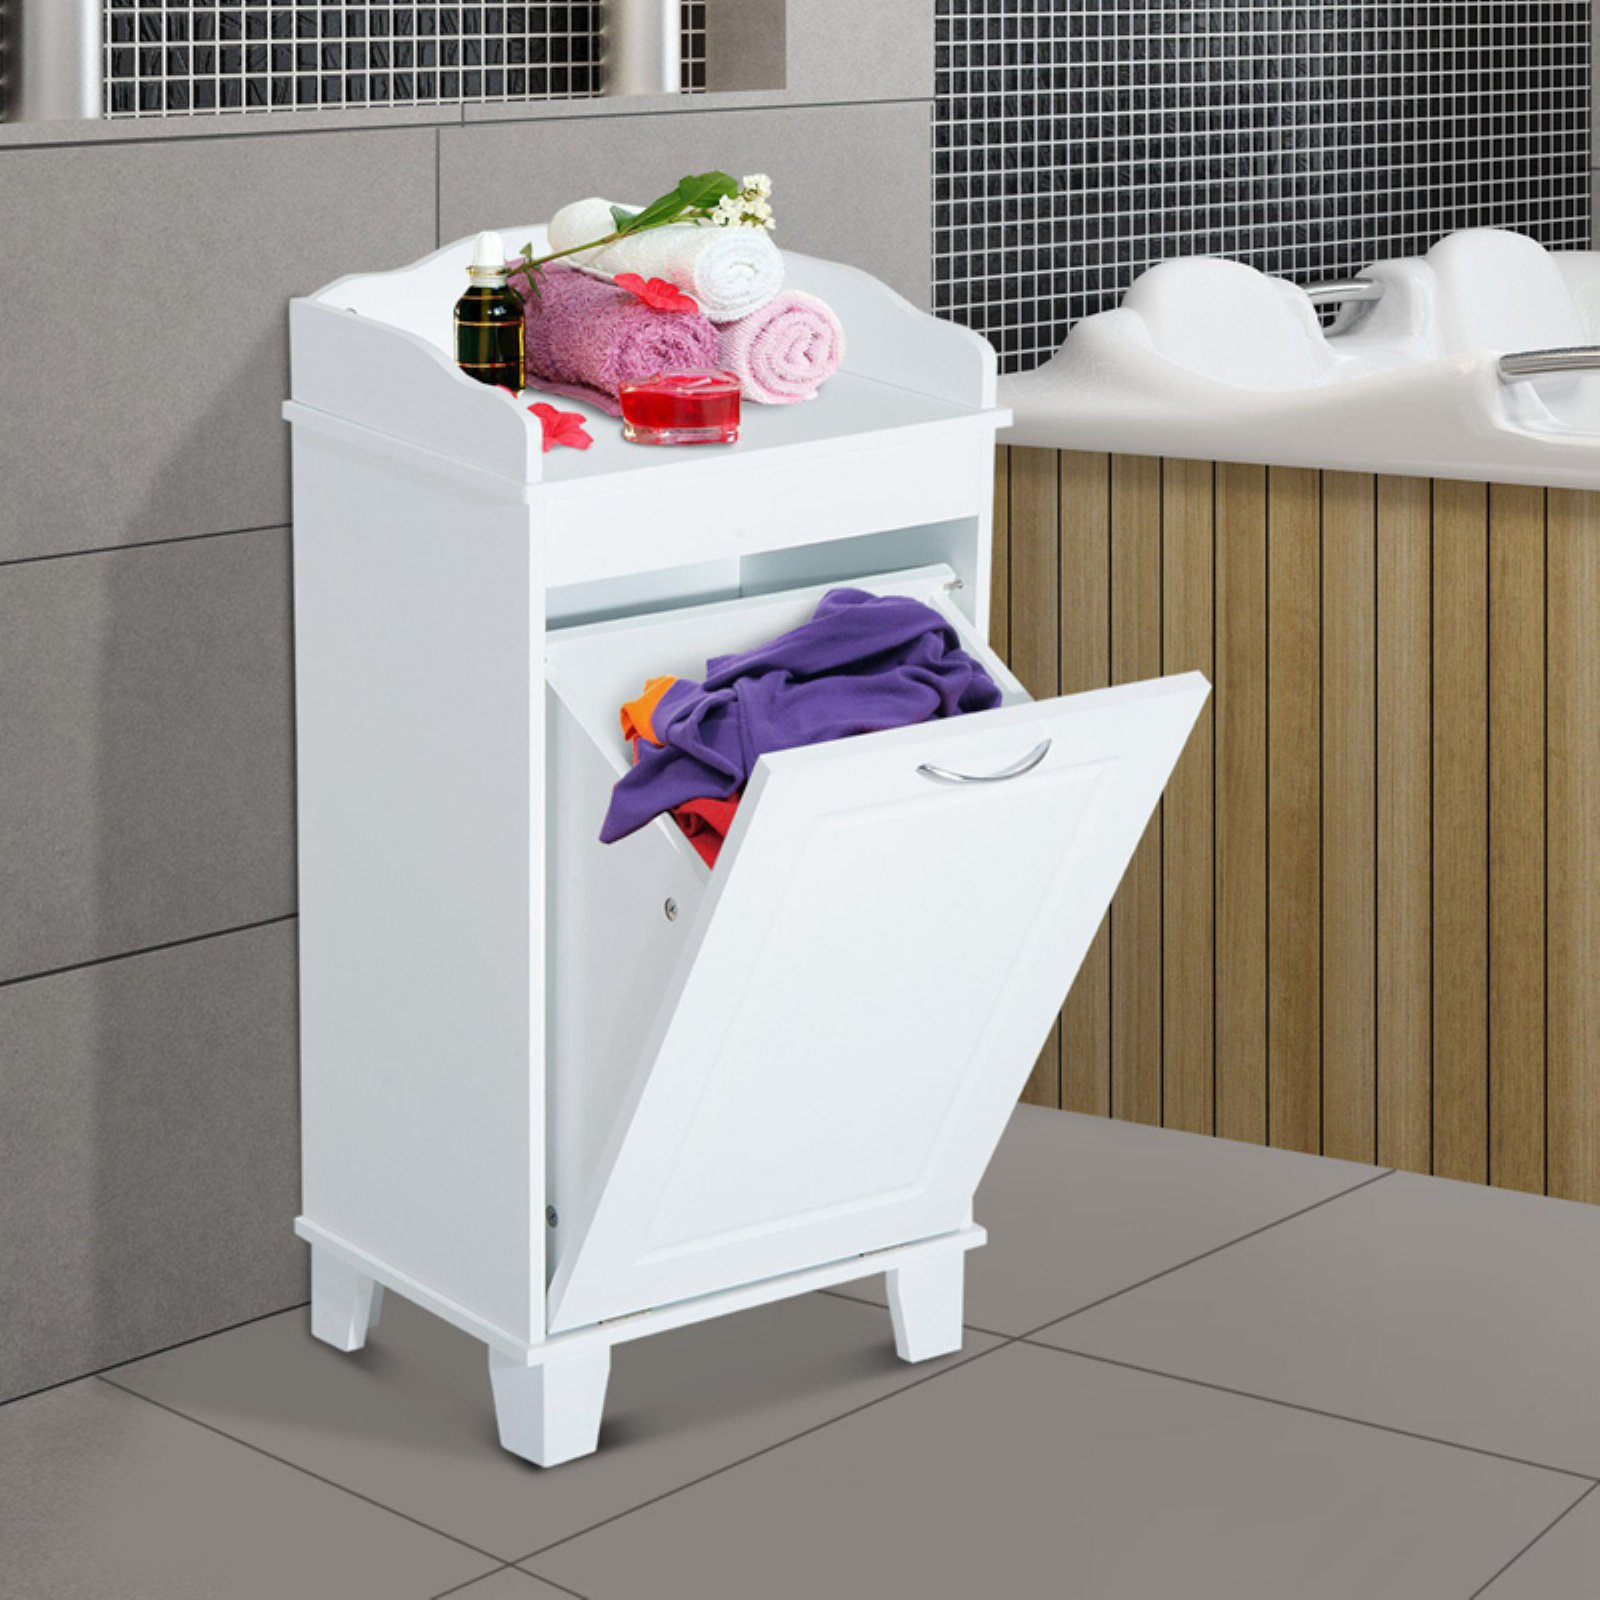 HomCom Wood Laundry Hamper Cabinet by Aosom